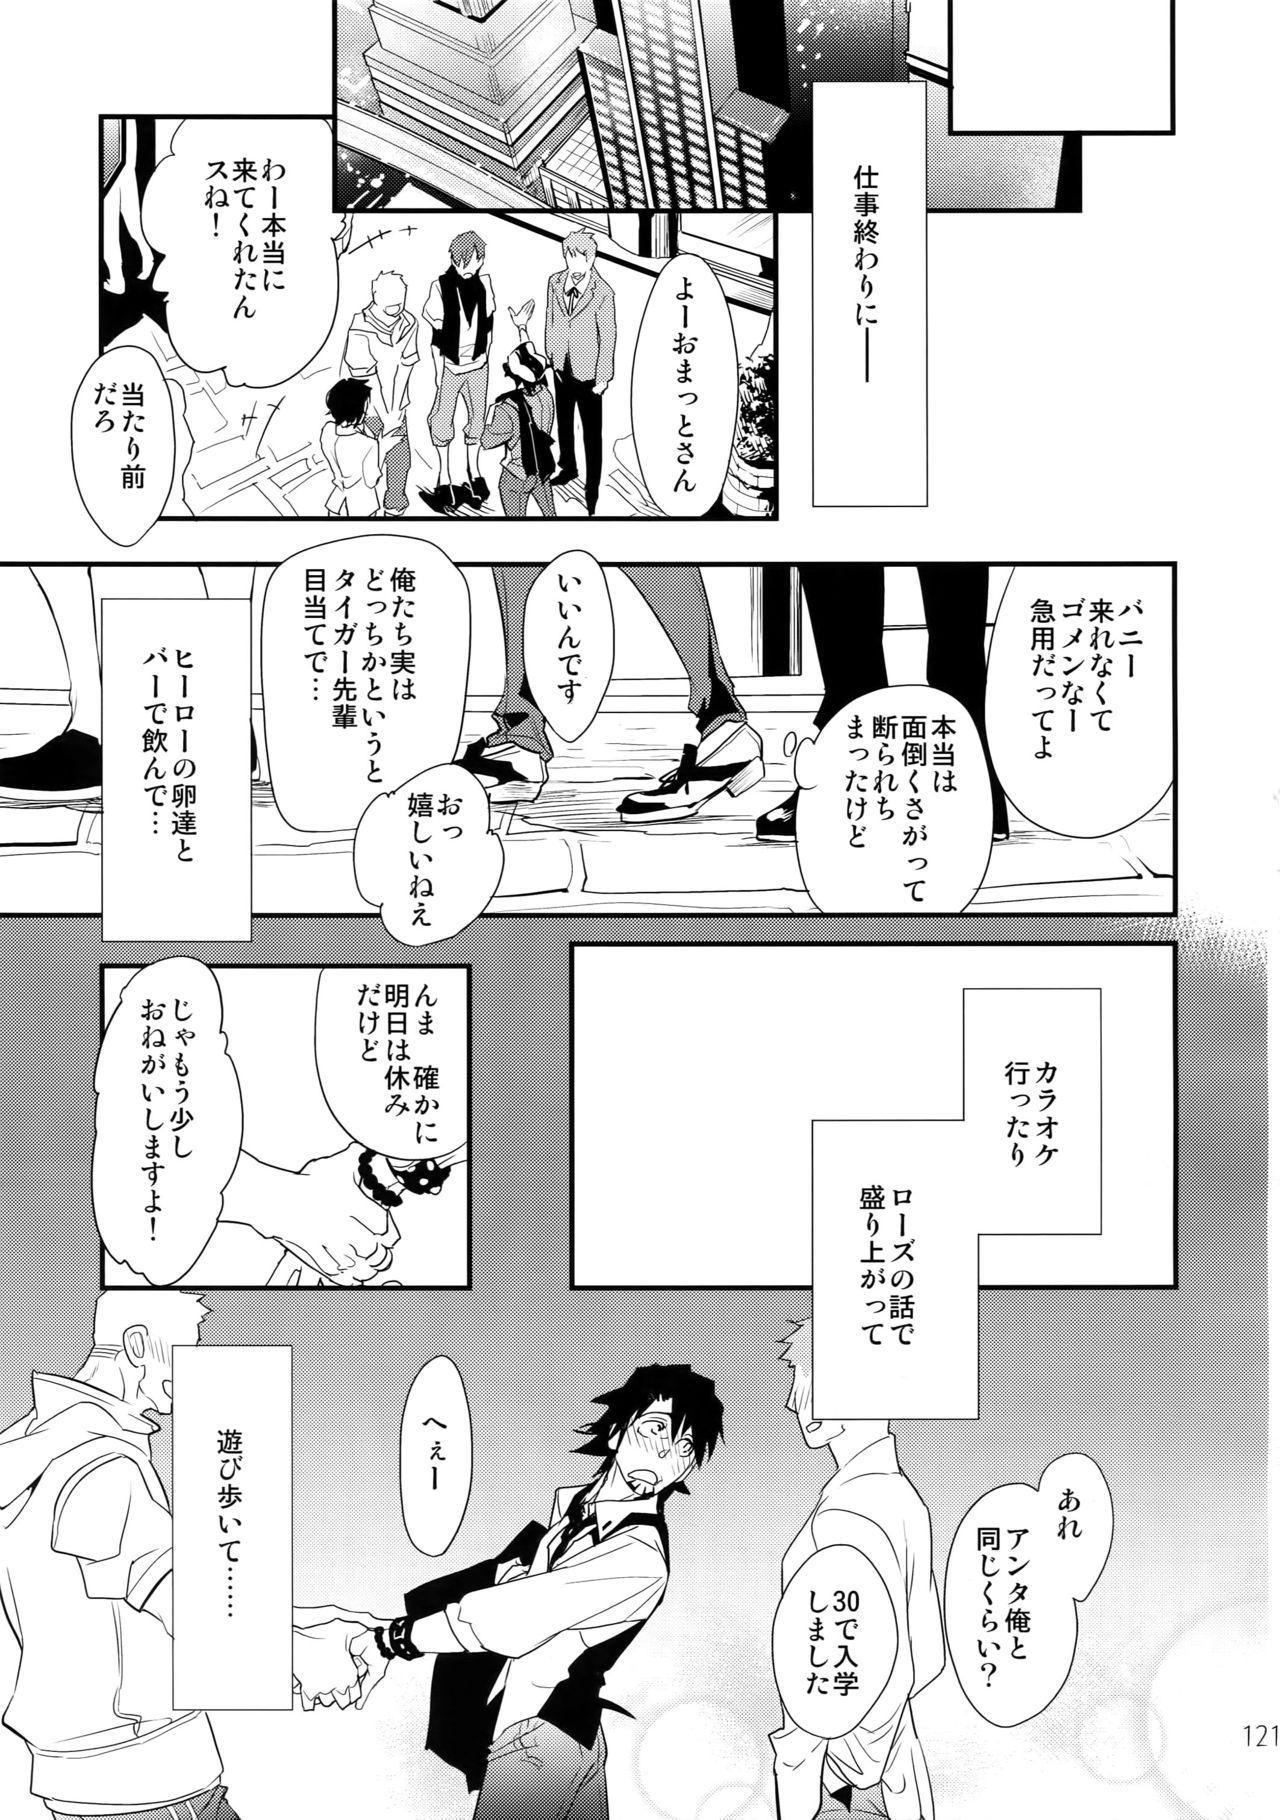 T&B Sairoku! 2 119